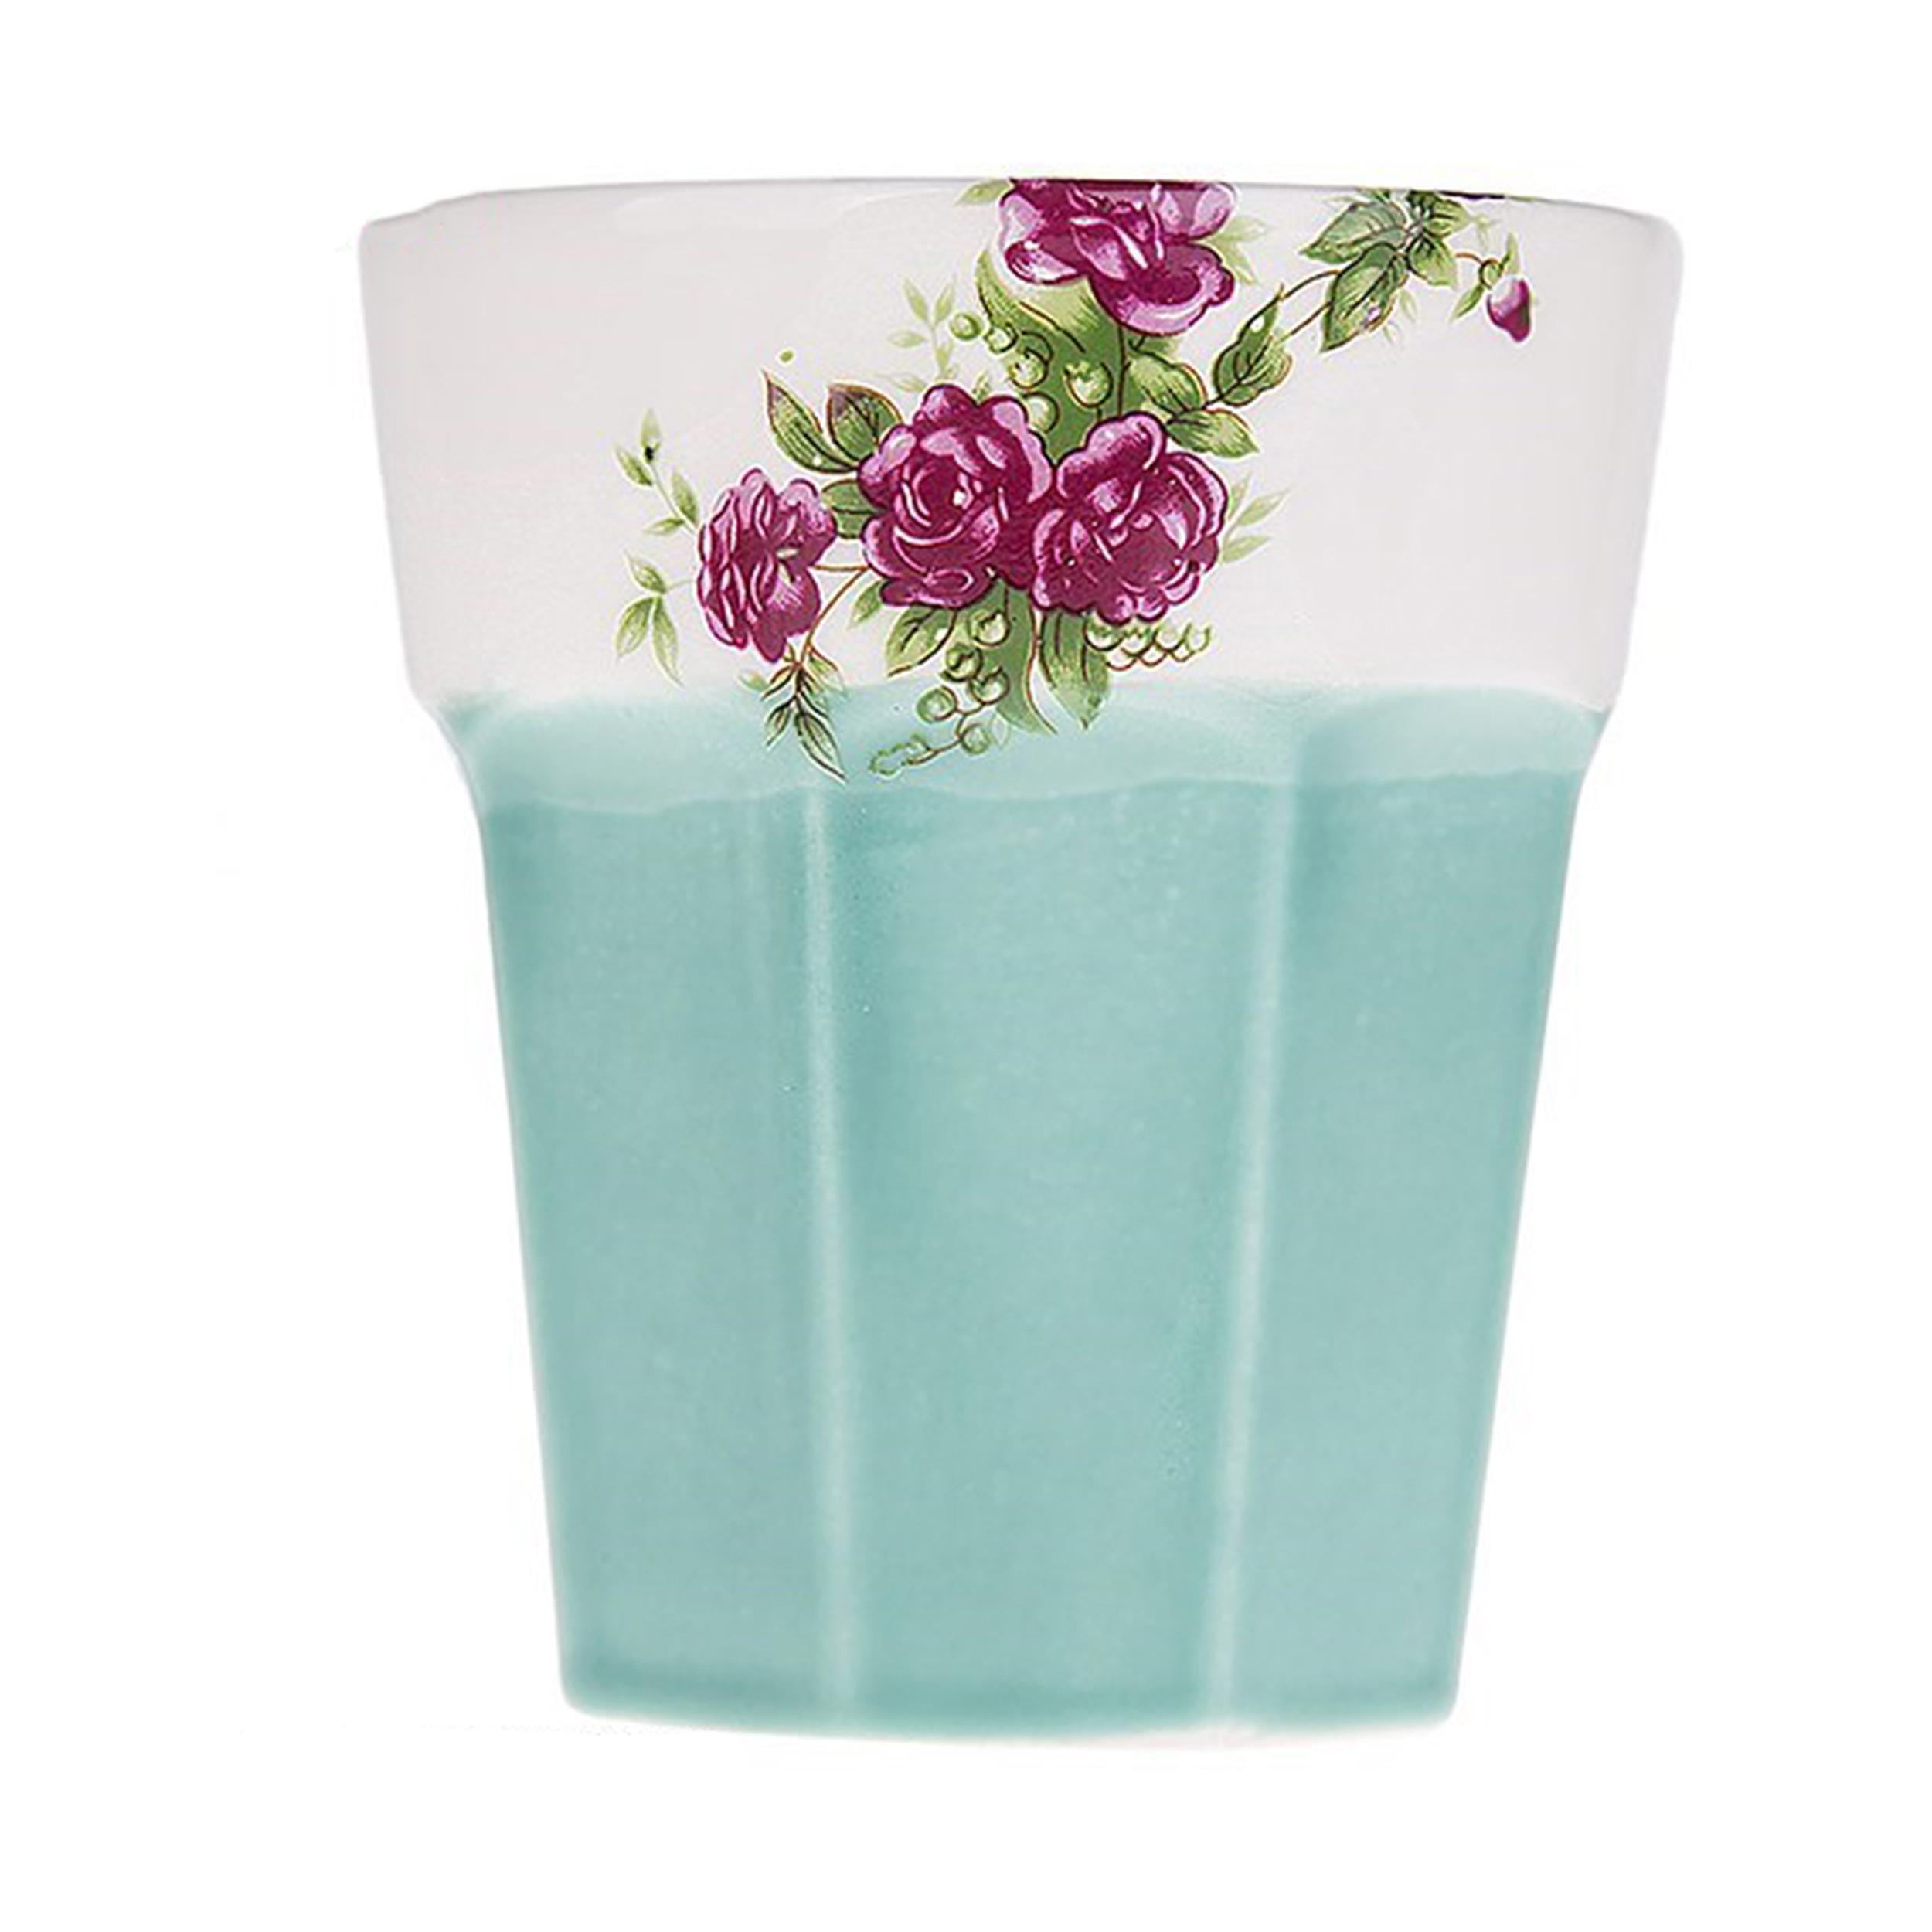 لیوان سرامیکی گالری میرانام طرح گل سرخ